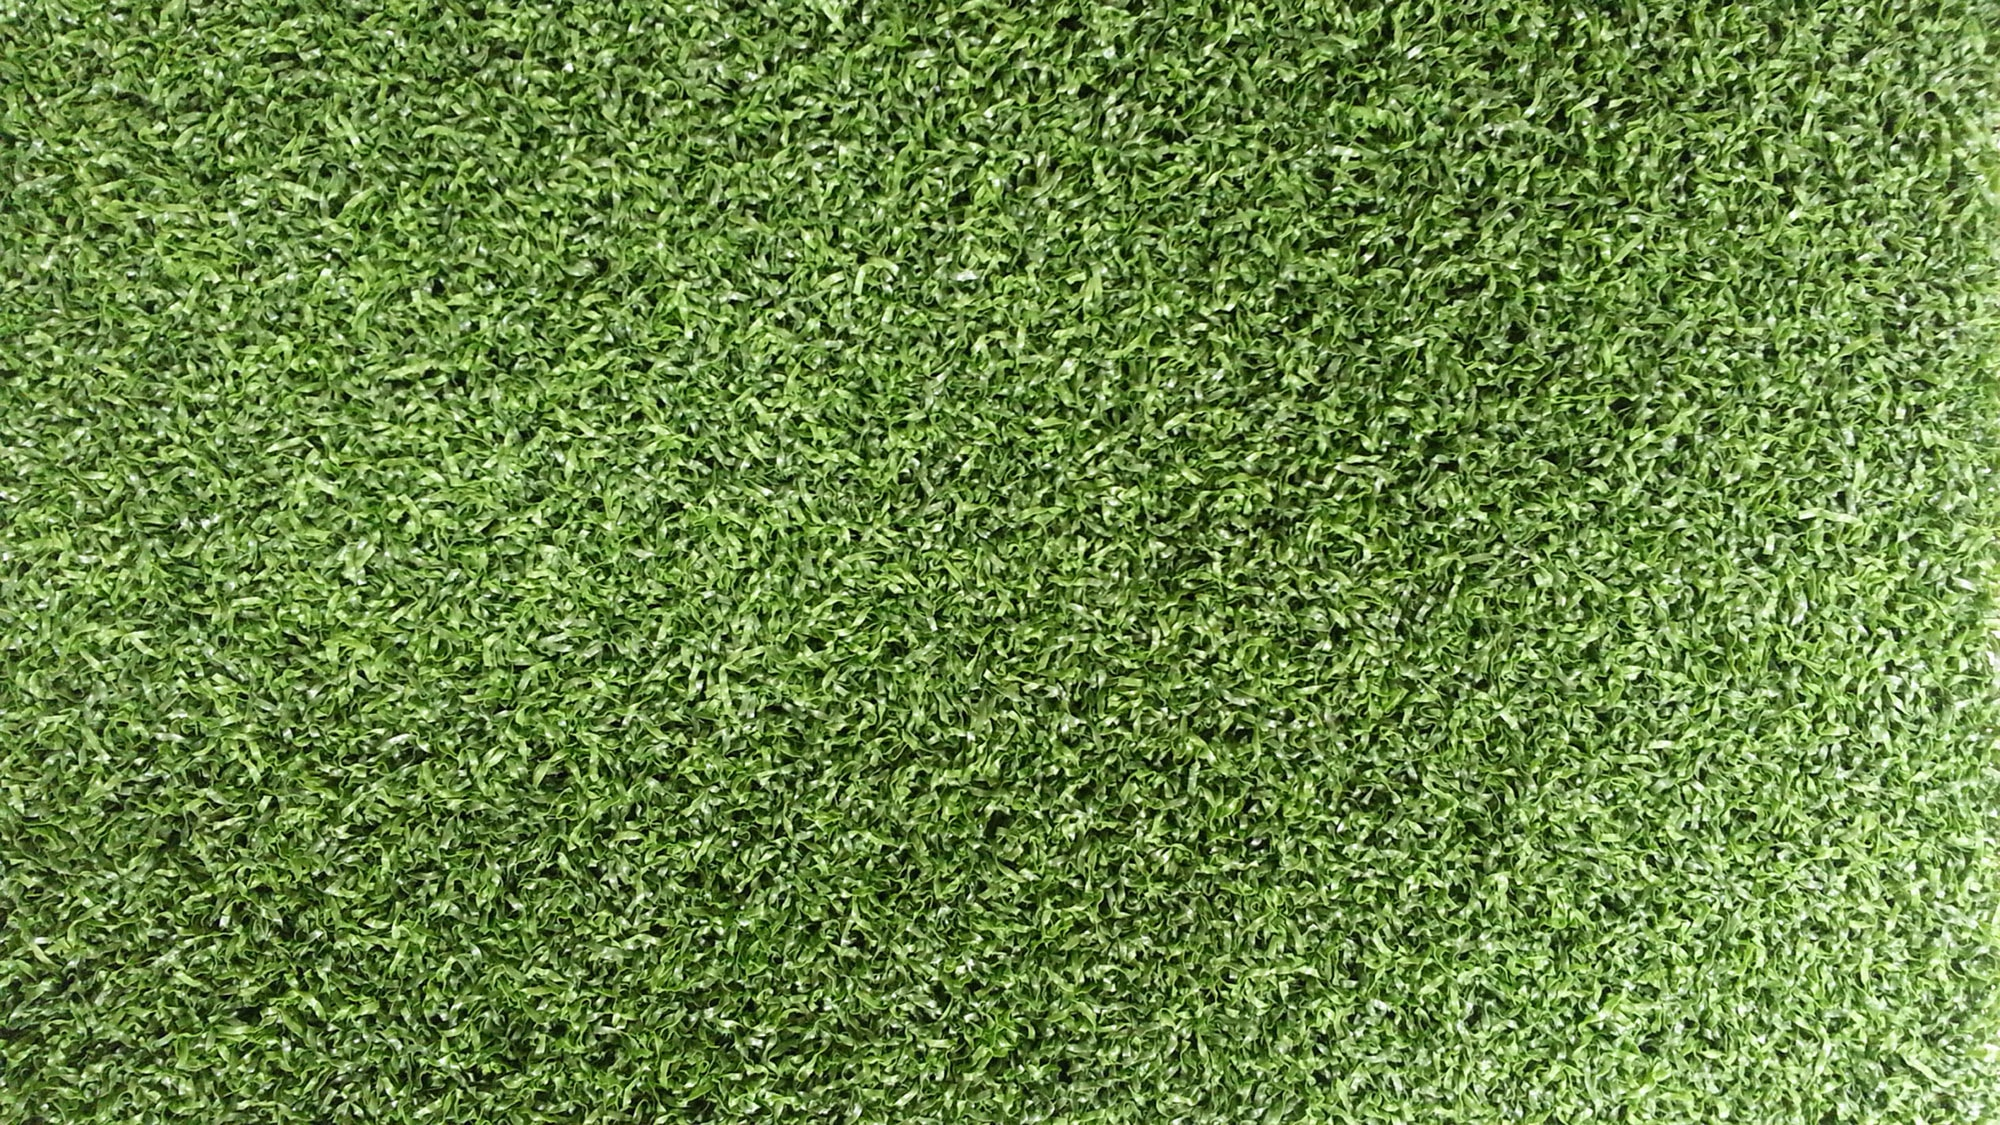 artificial turf texture. Artificial Turf Texture M